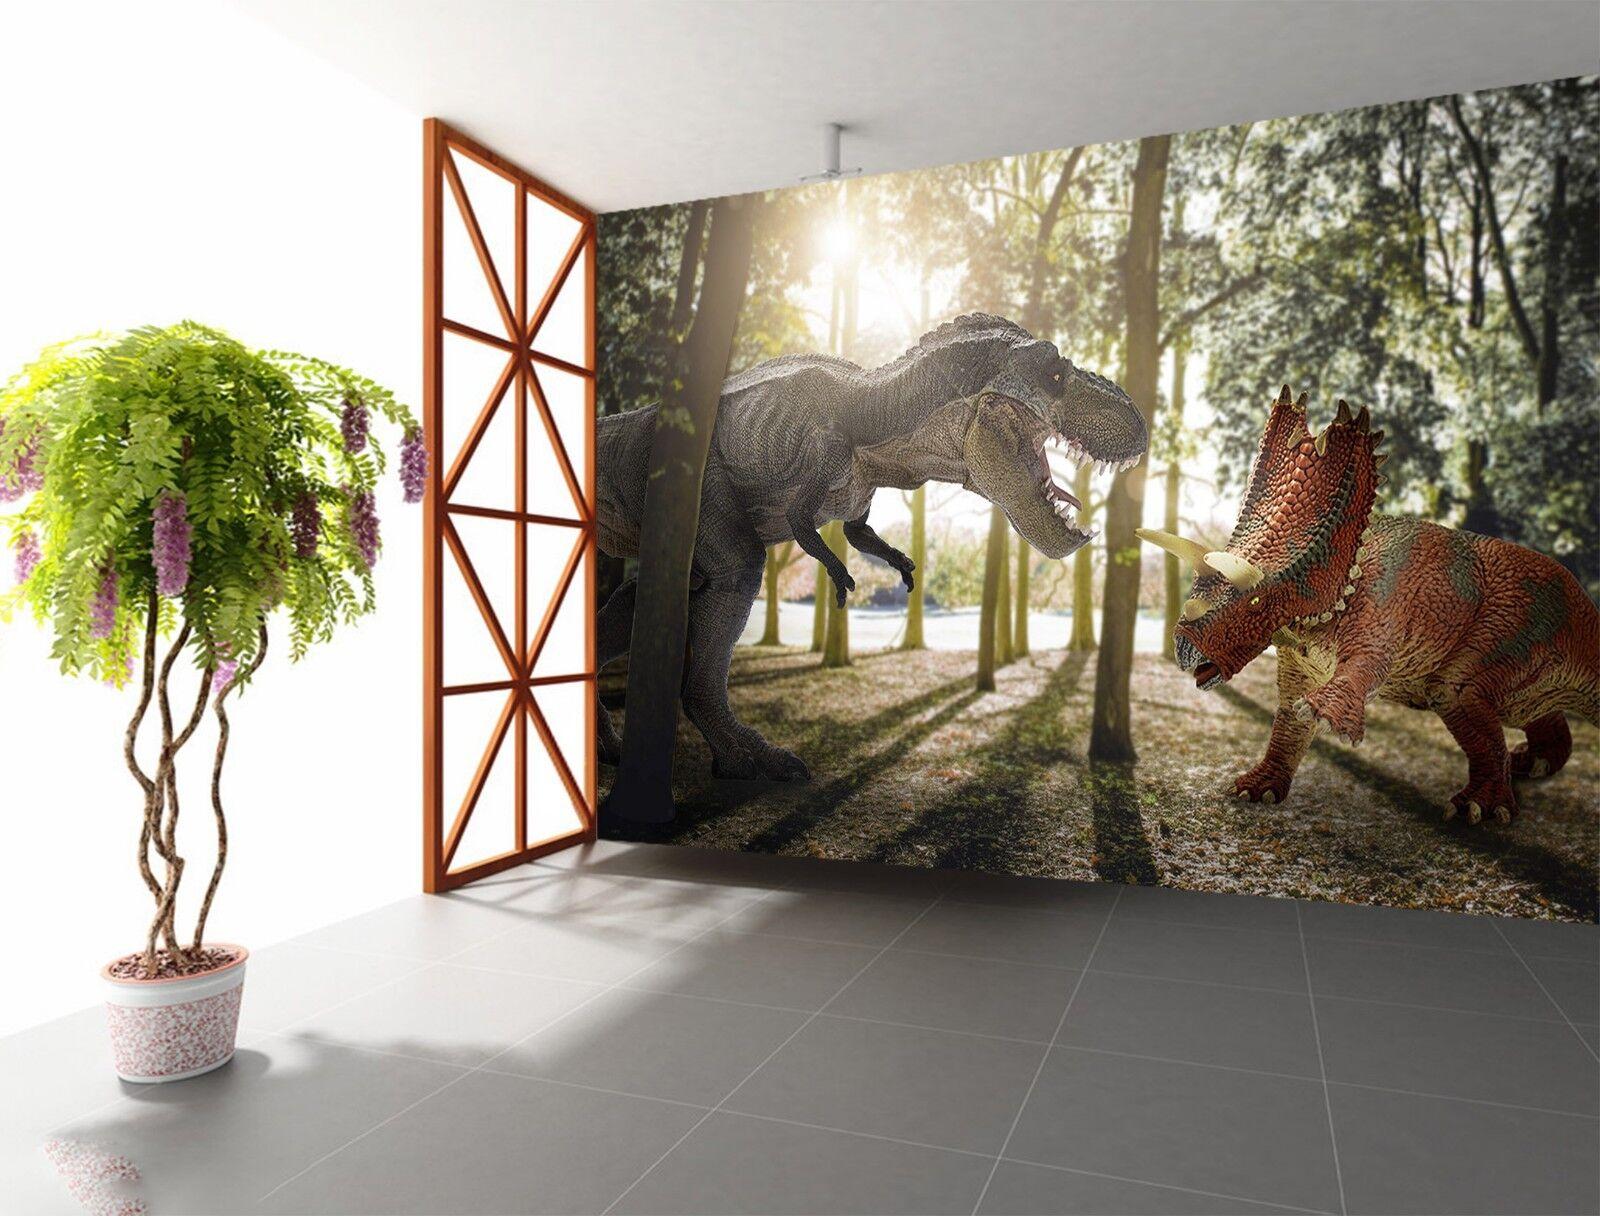 3D Waldland Dinosaurier Krieg 1 Tapete Wandgemälde Tapete Tapeten Familie Kinde